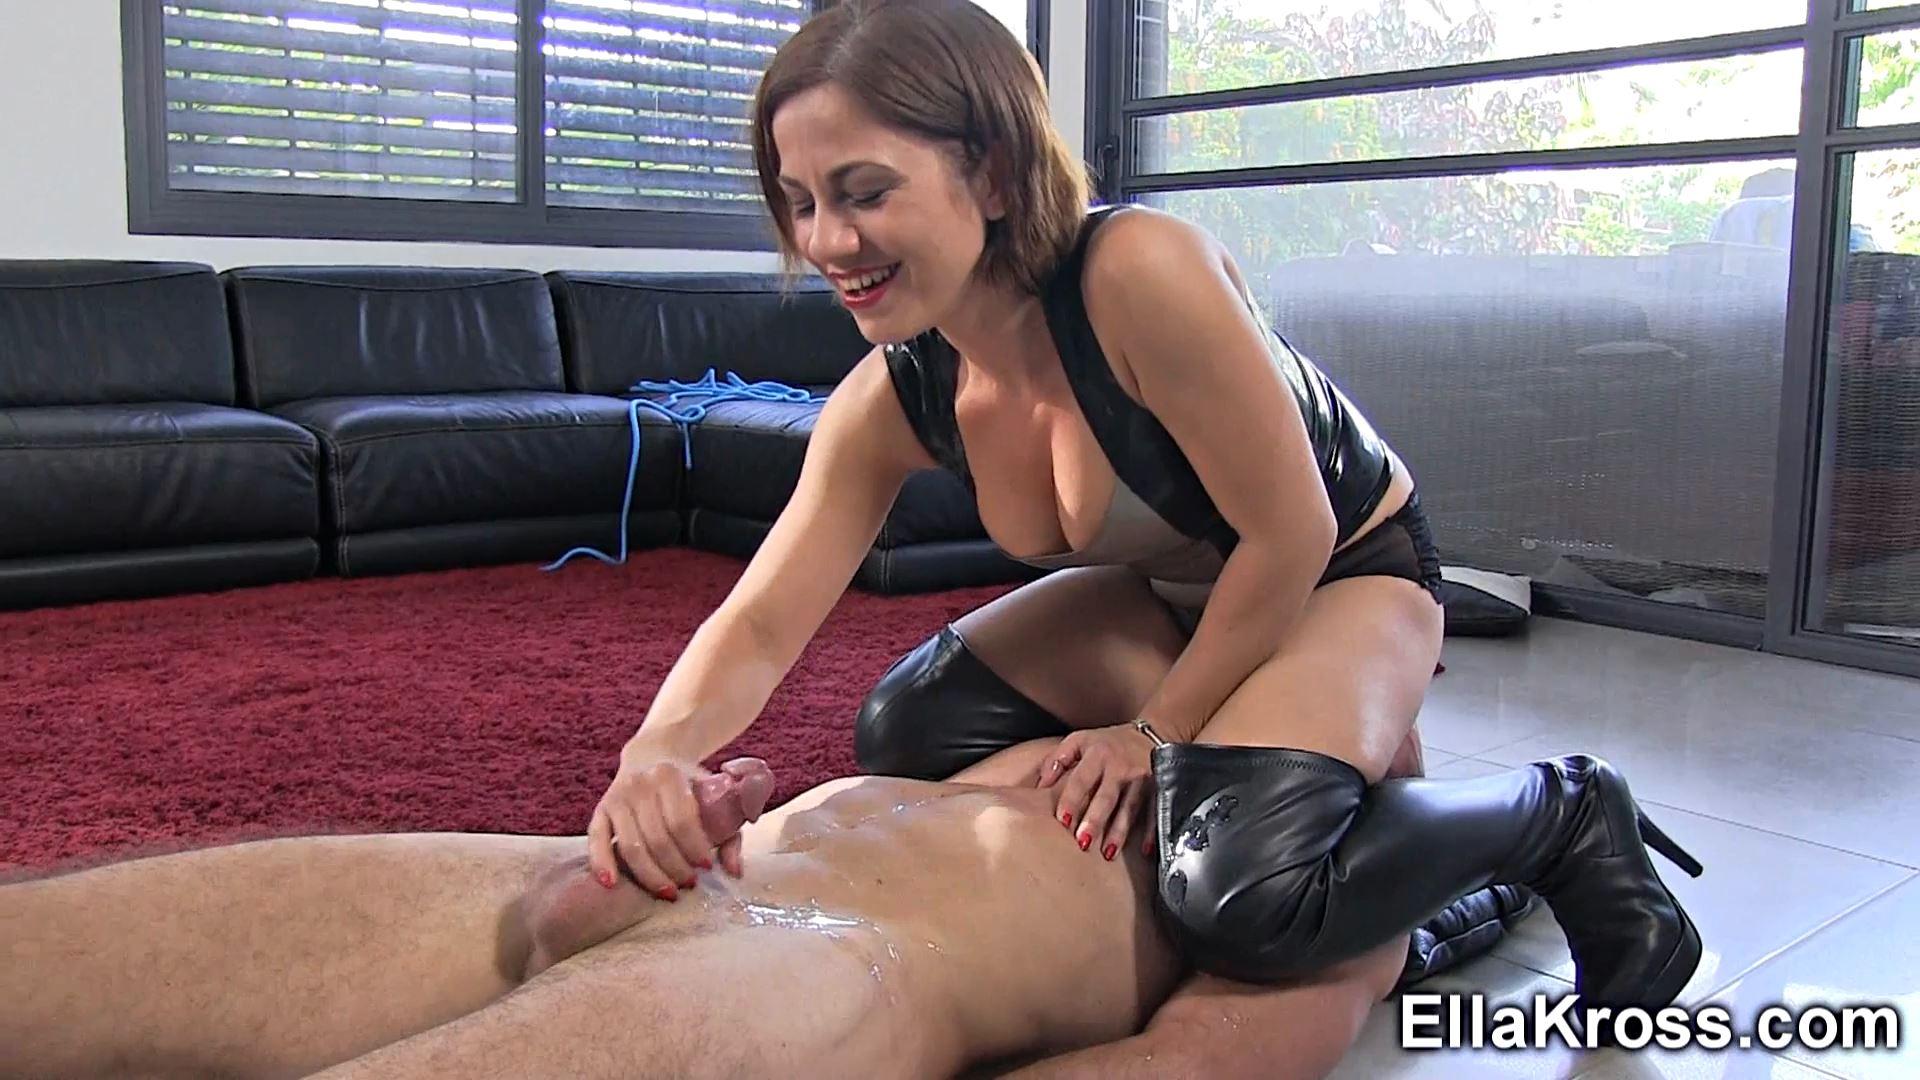 Ella Kross In Scene: Four Totally Ruined Orgasms - ELLAKROSS - FULL HD/1080p/MP4